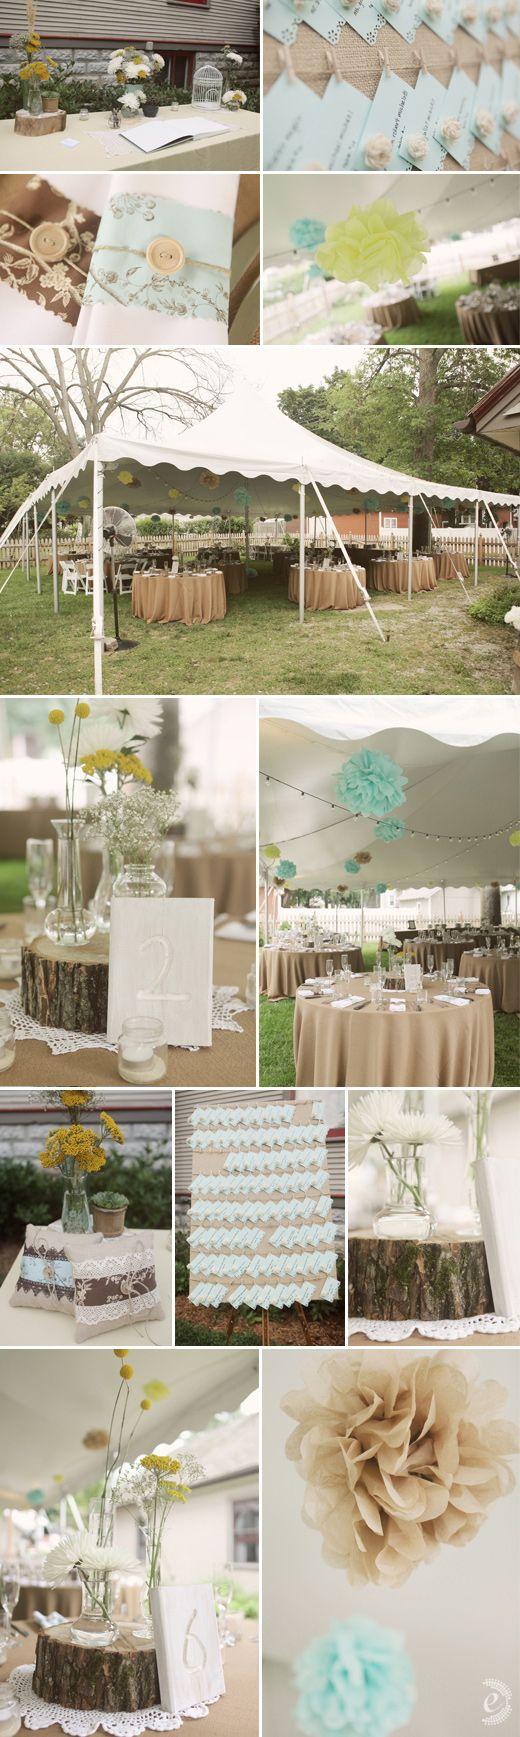 Denise & Dave's Real Backyard Wedding | Edyta Szyszlo Photography